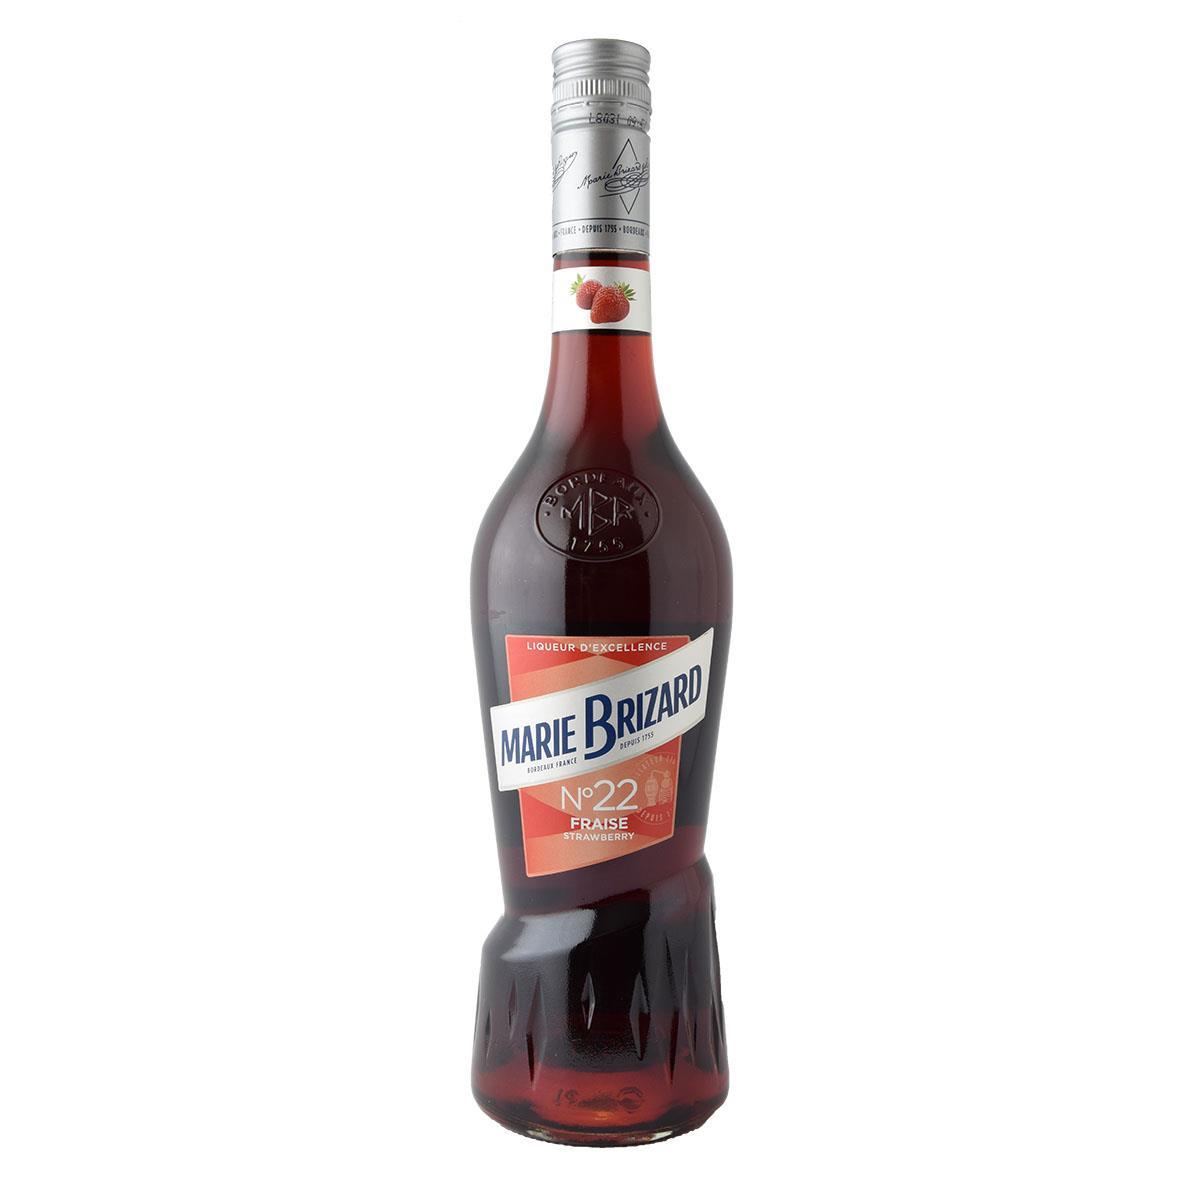 Marie Brizard Strawberry Liqueur 700ml